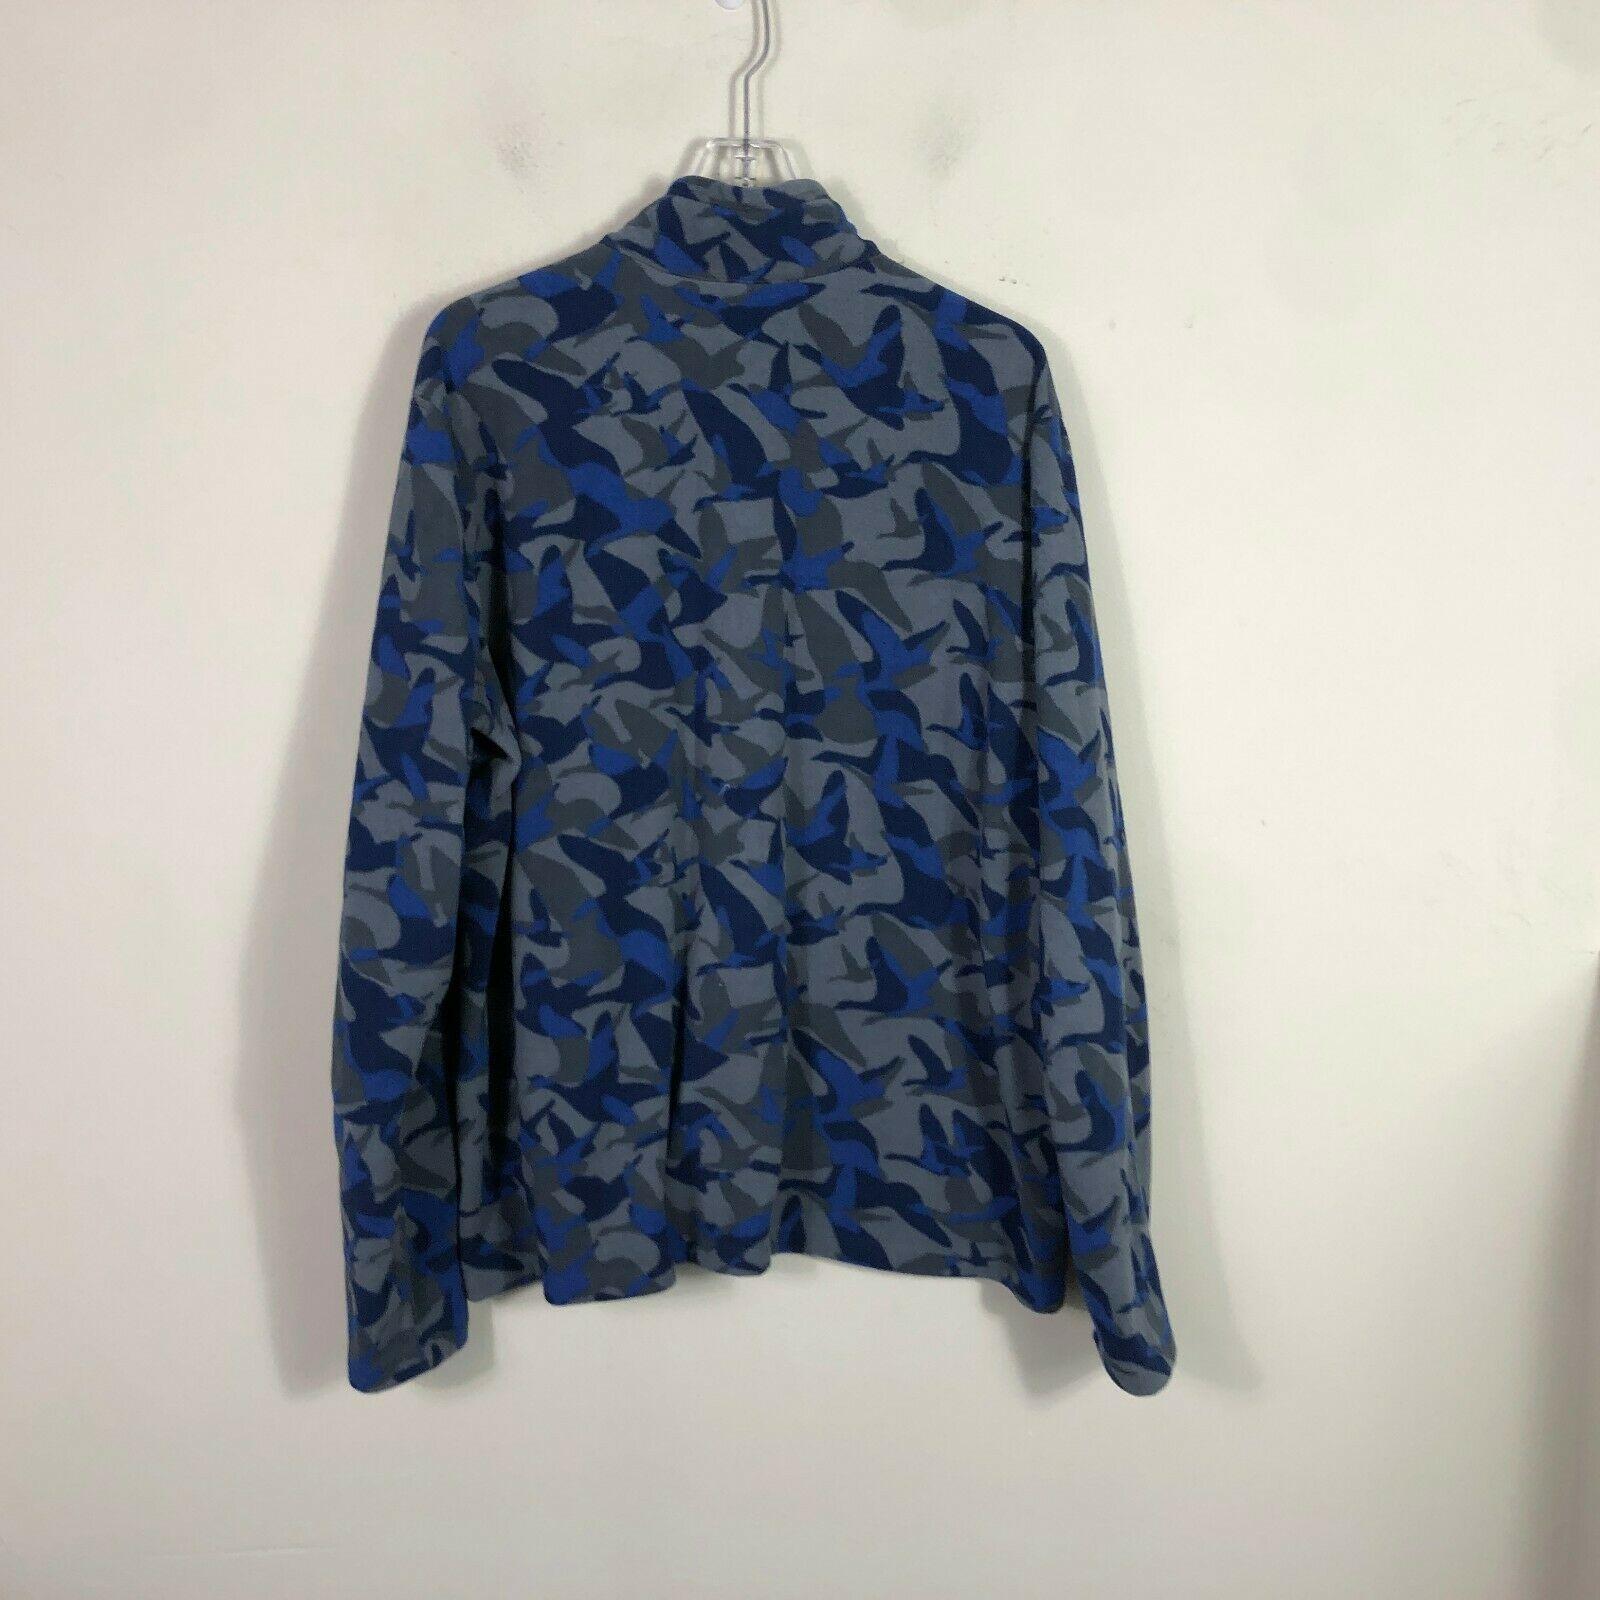 Eddie Bauer First Ascent Fleece Jacket 1/2 Zip Men's 2XL Blue Gray Long Sleeve image 2